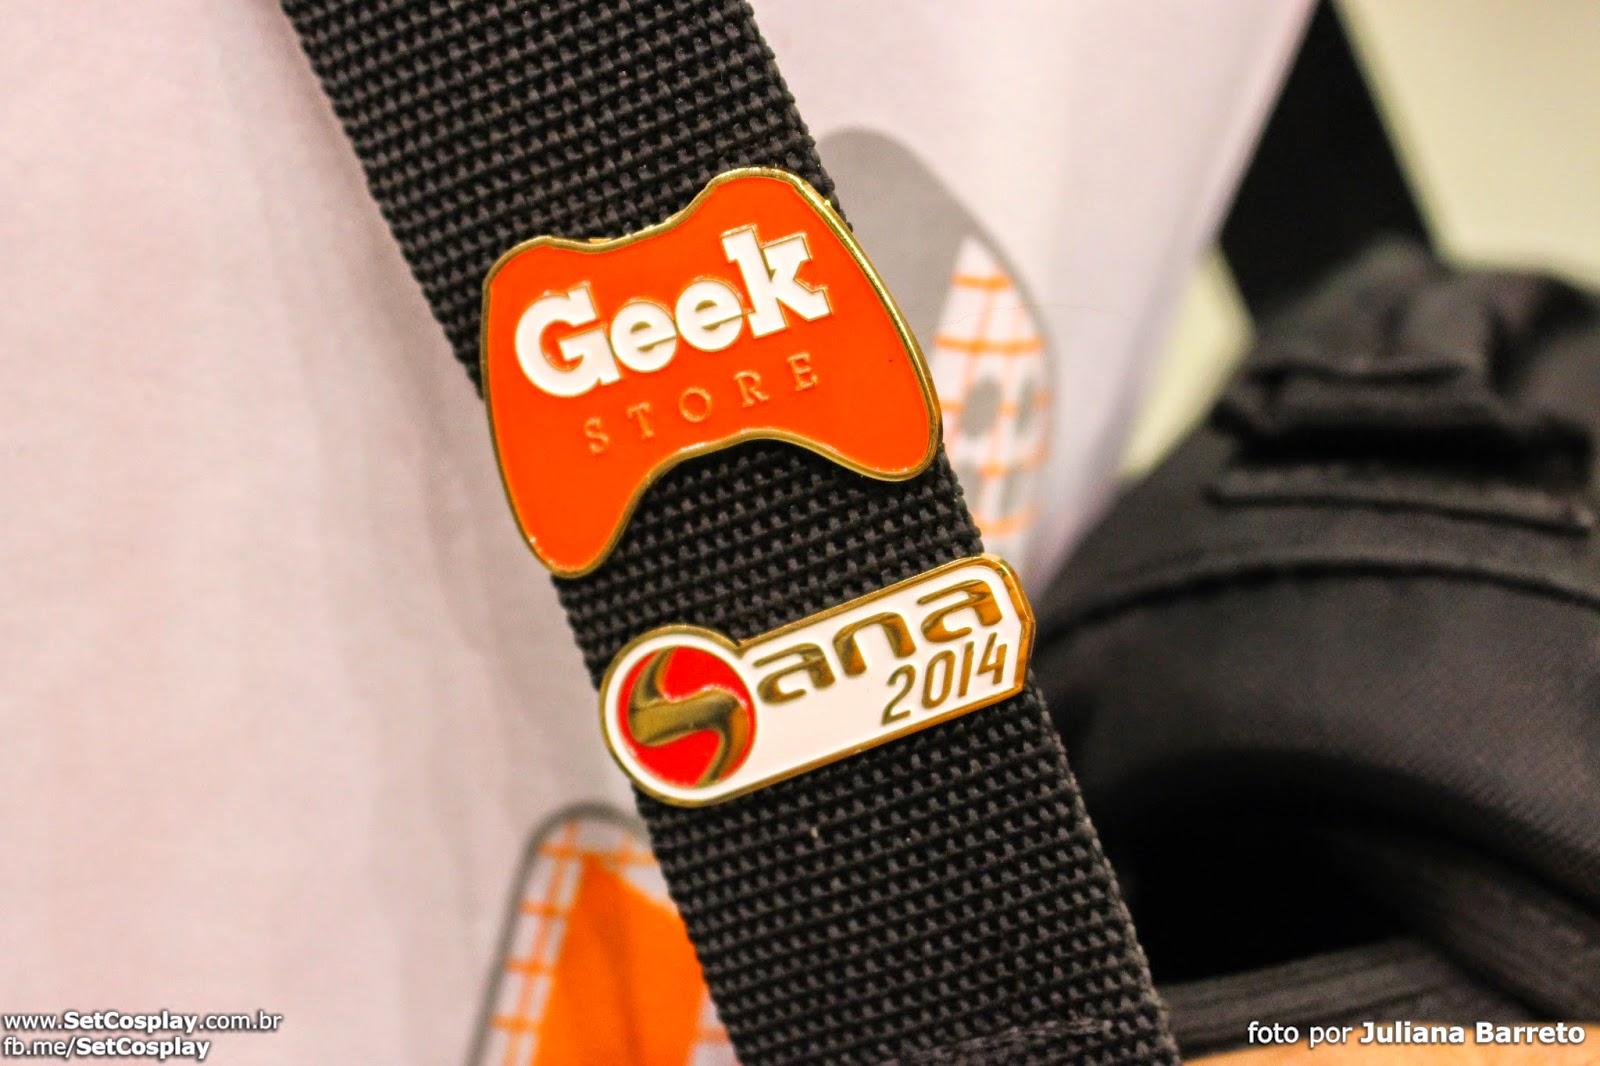 SANA 2014 e Geek Store